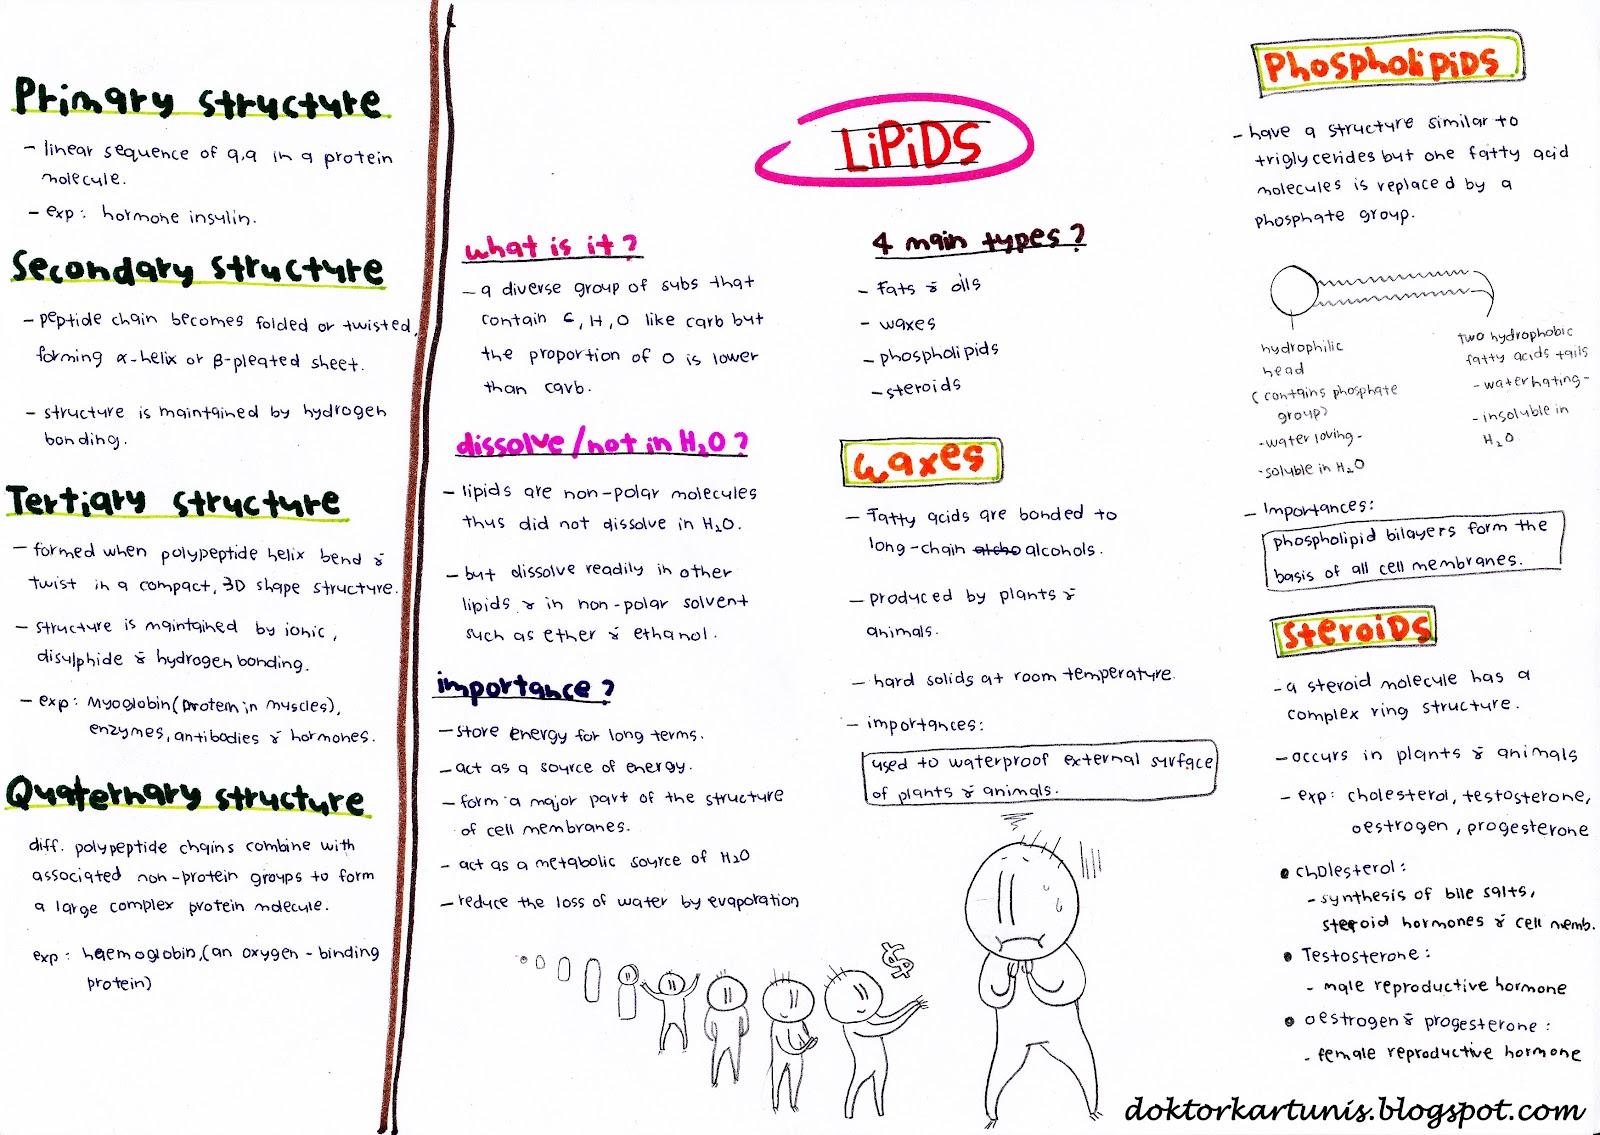 spm biology Peperiksaan sebenar spm tahun 2012 lembaga peperiksaan, kementerian pelajaran malaysia, putrajaya biologi kertas 2, 3 (biology paper 2, 3 spm year 2012.